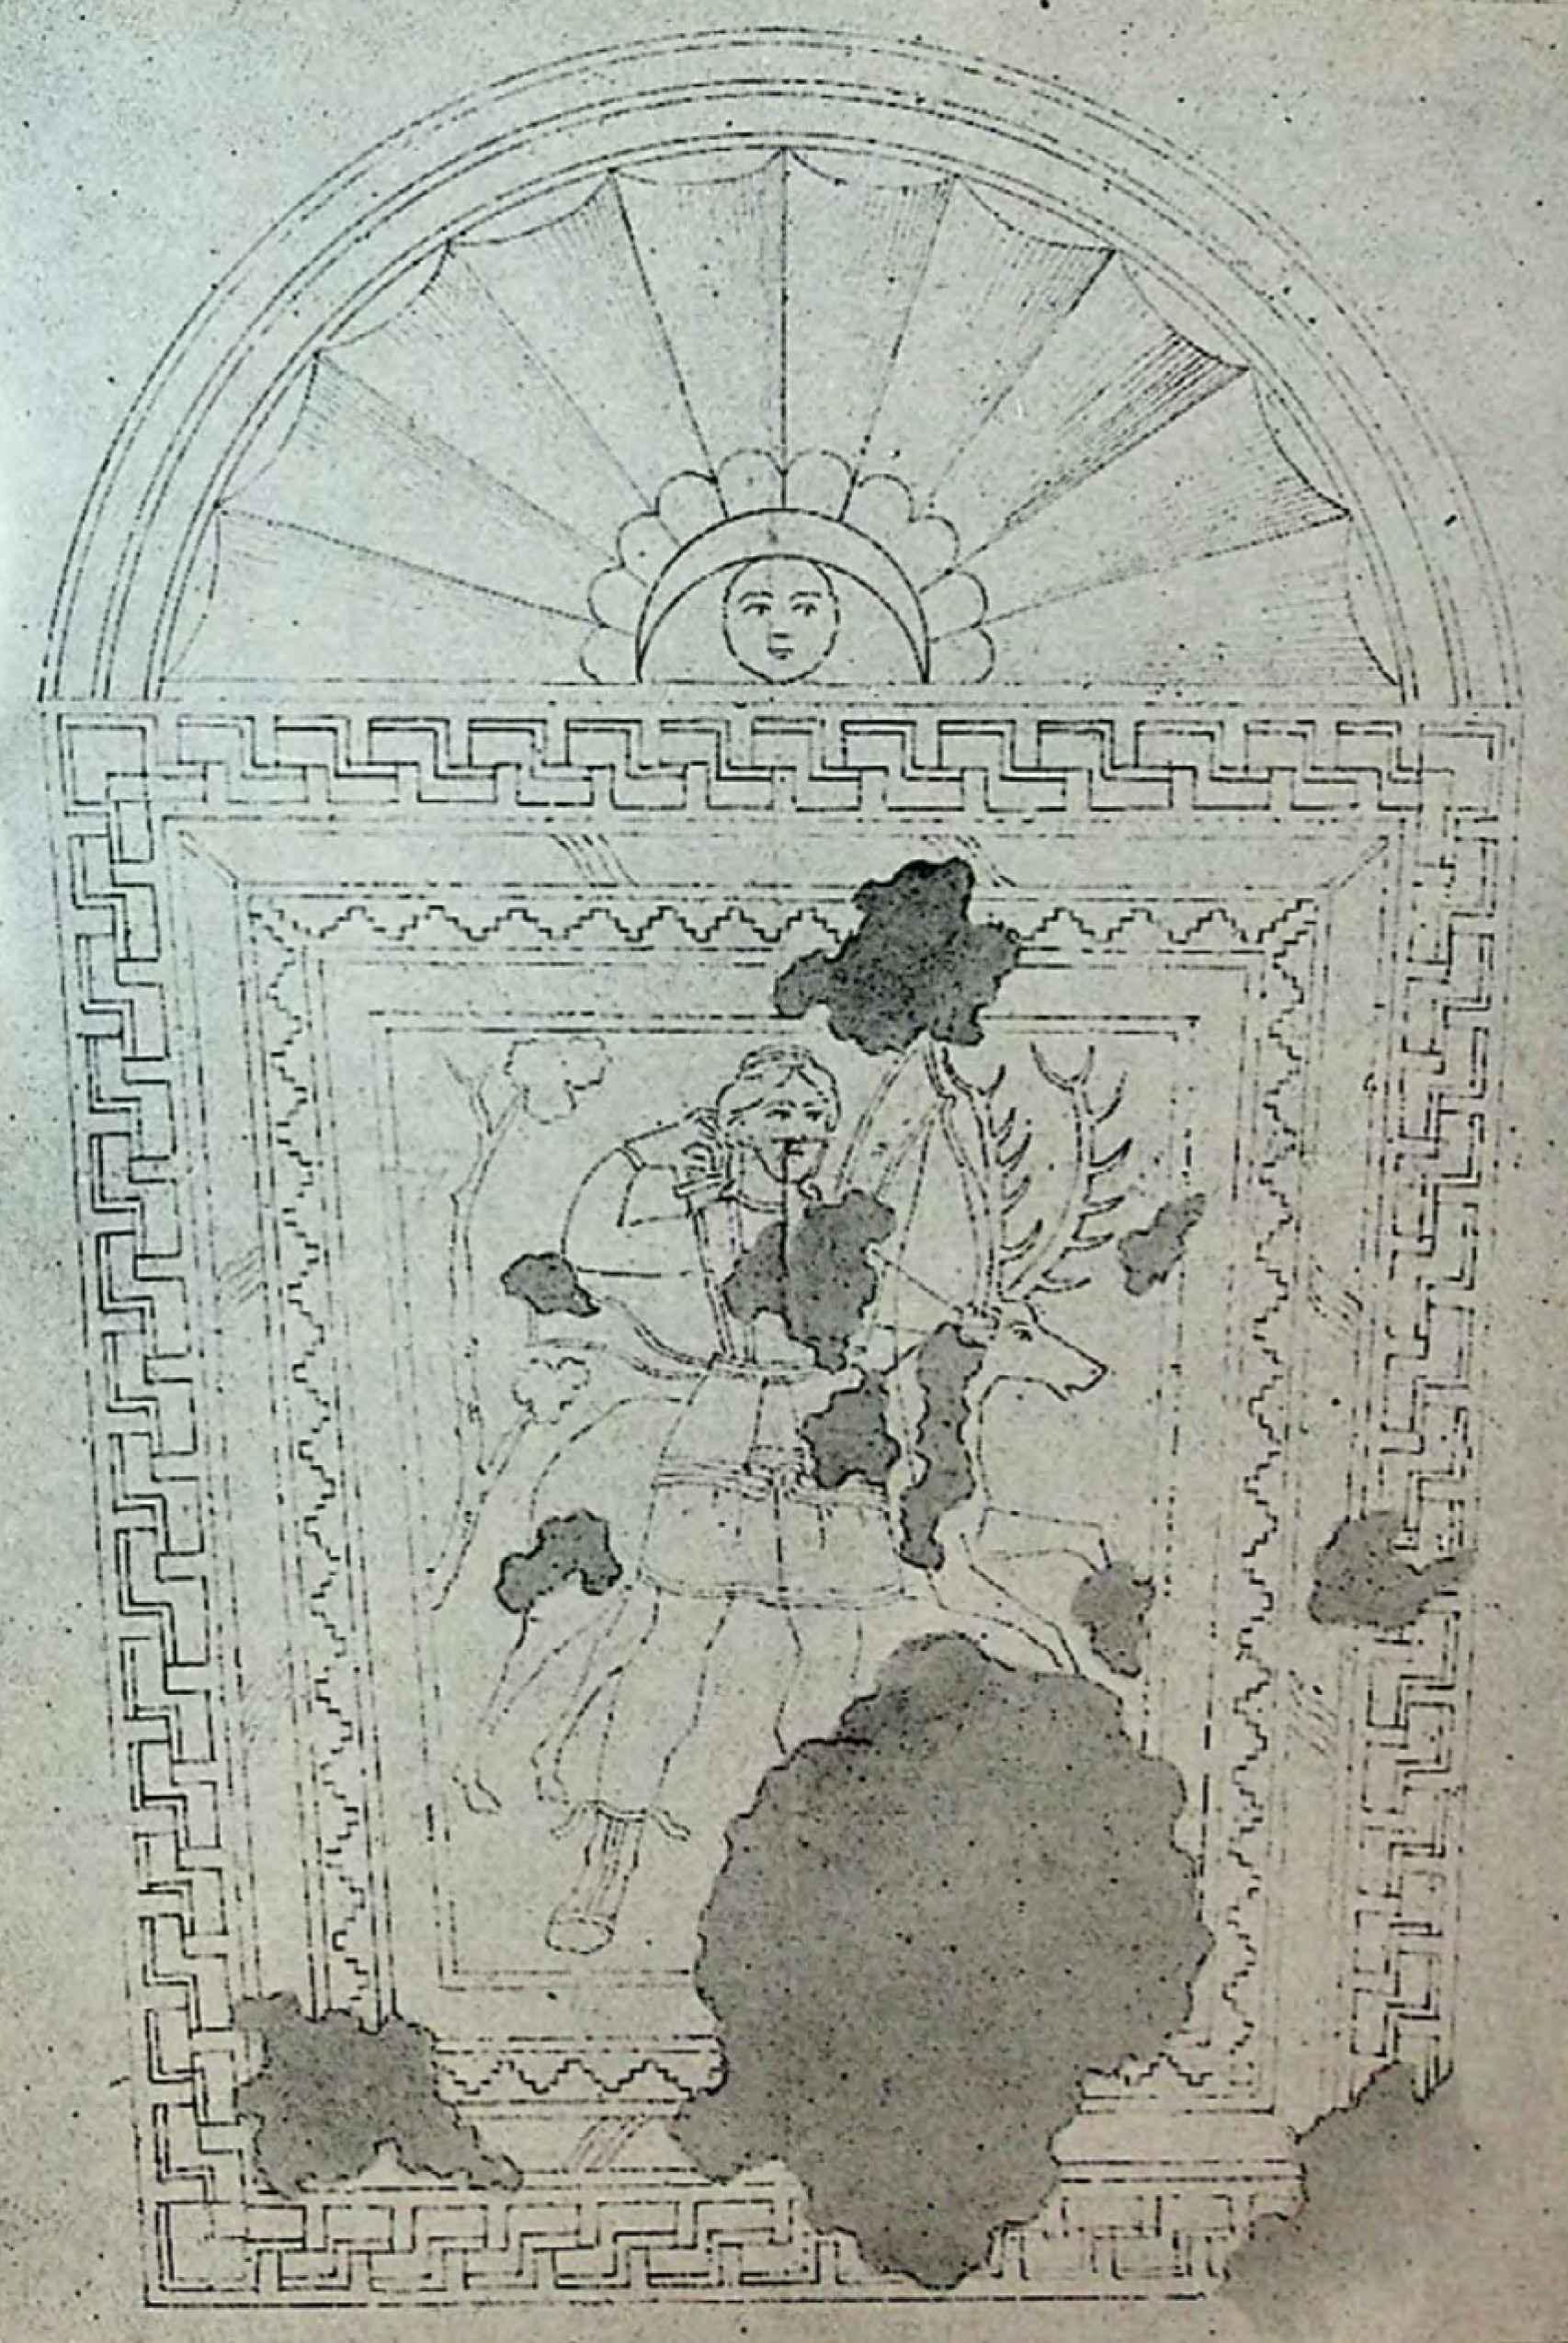 Dibujo del mosaico romano desaparecido de Diana (1862).